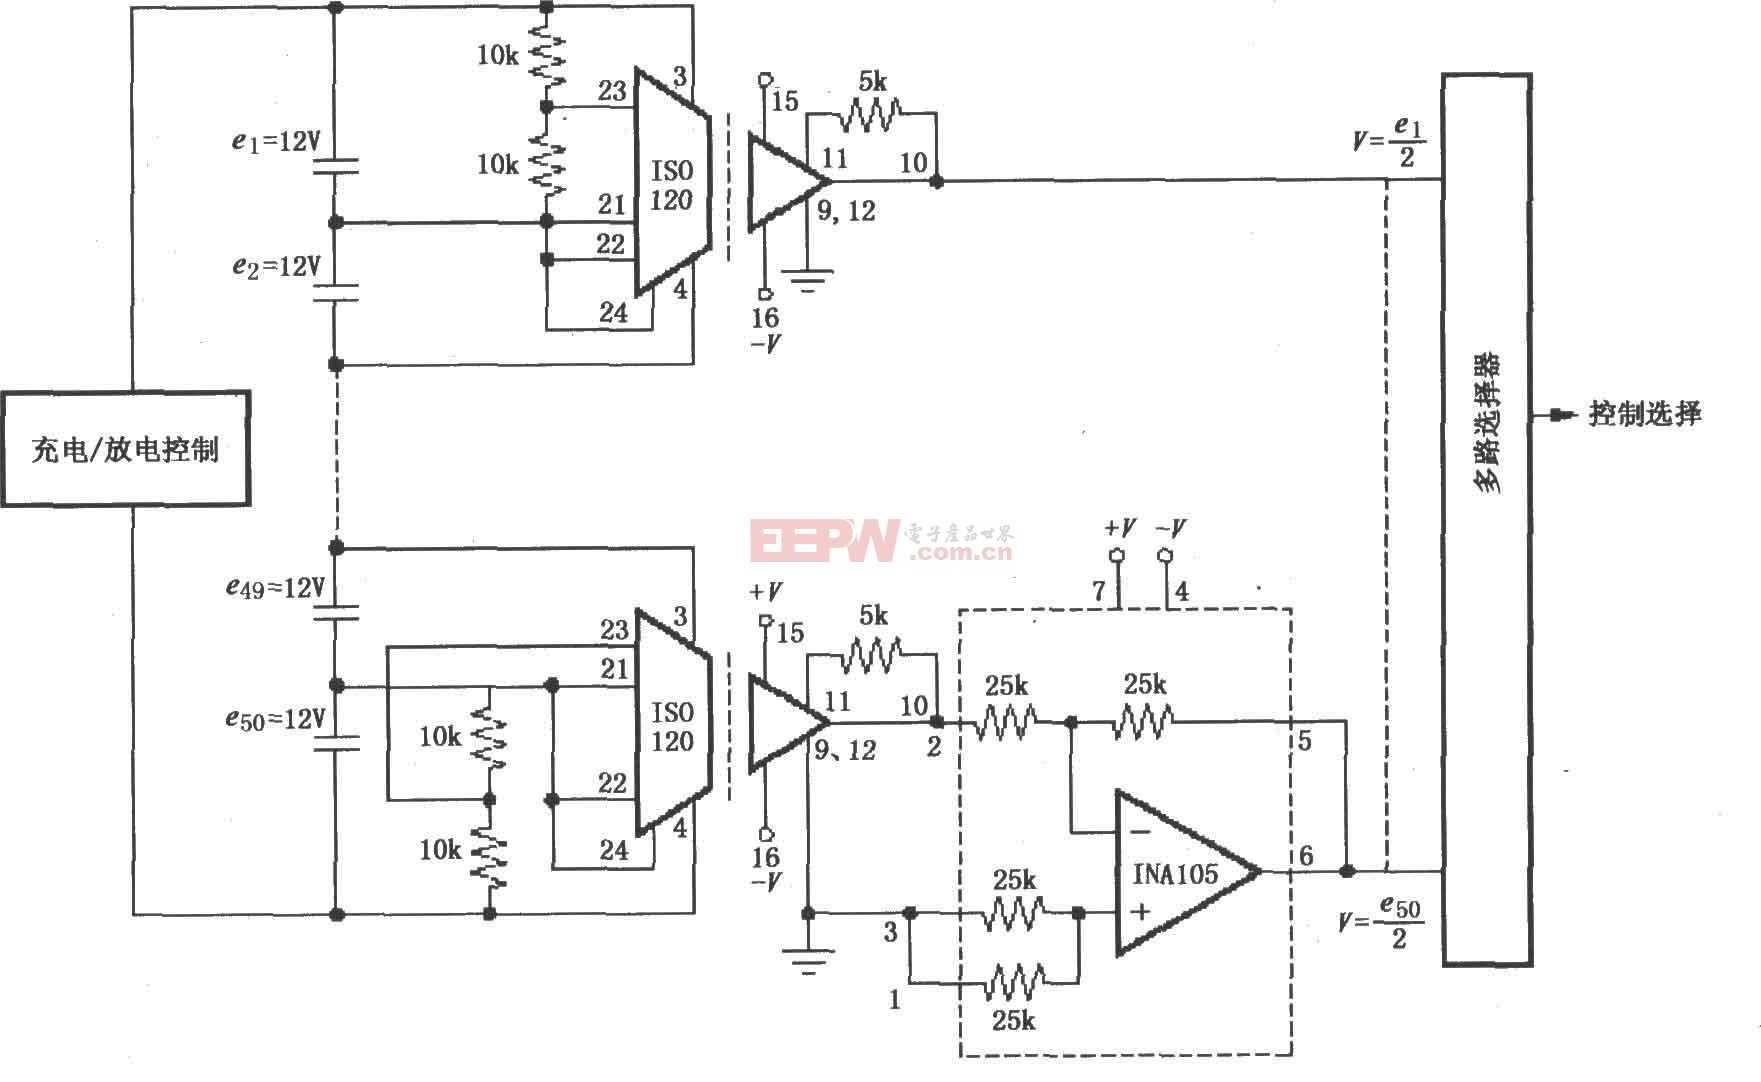 ISO120与仪表放大器INA105、多路选择器构成的600V电池系统的电池监控电路图